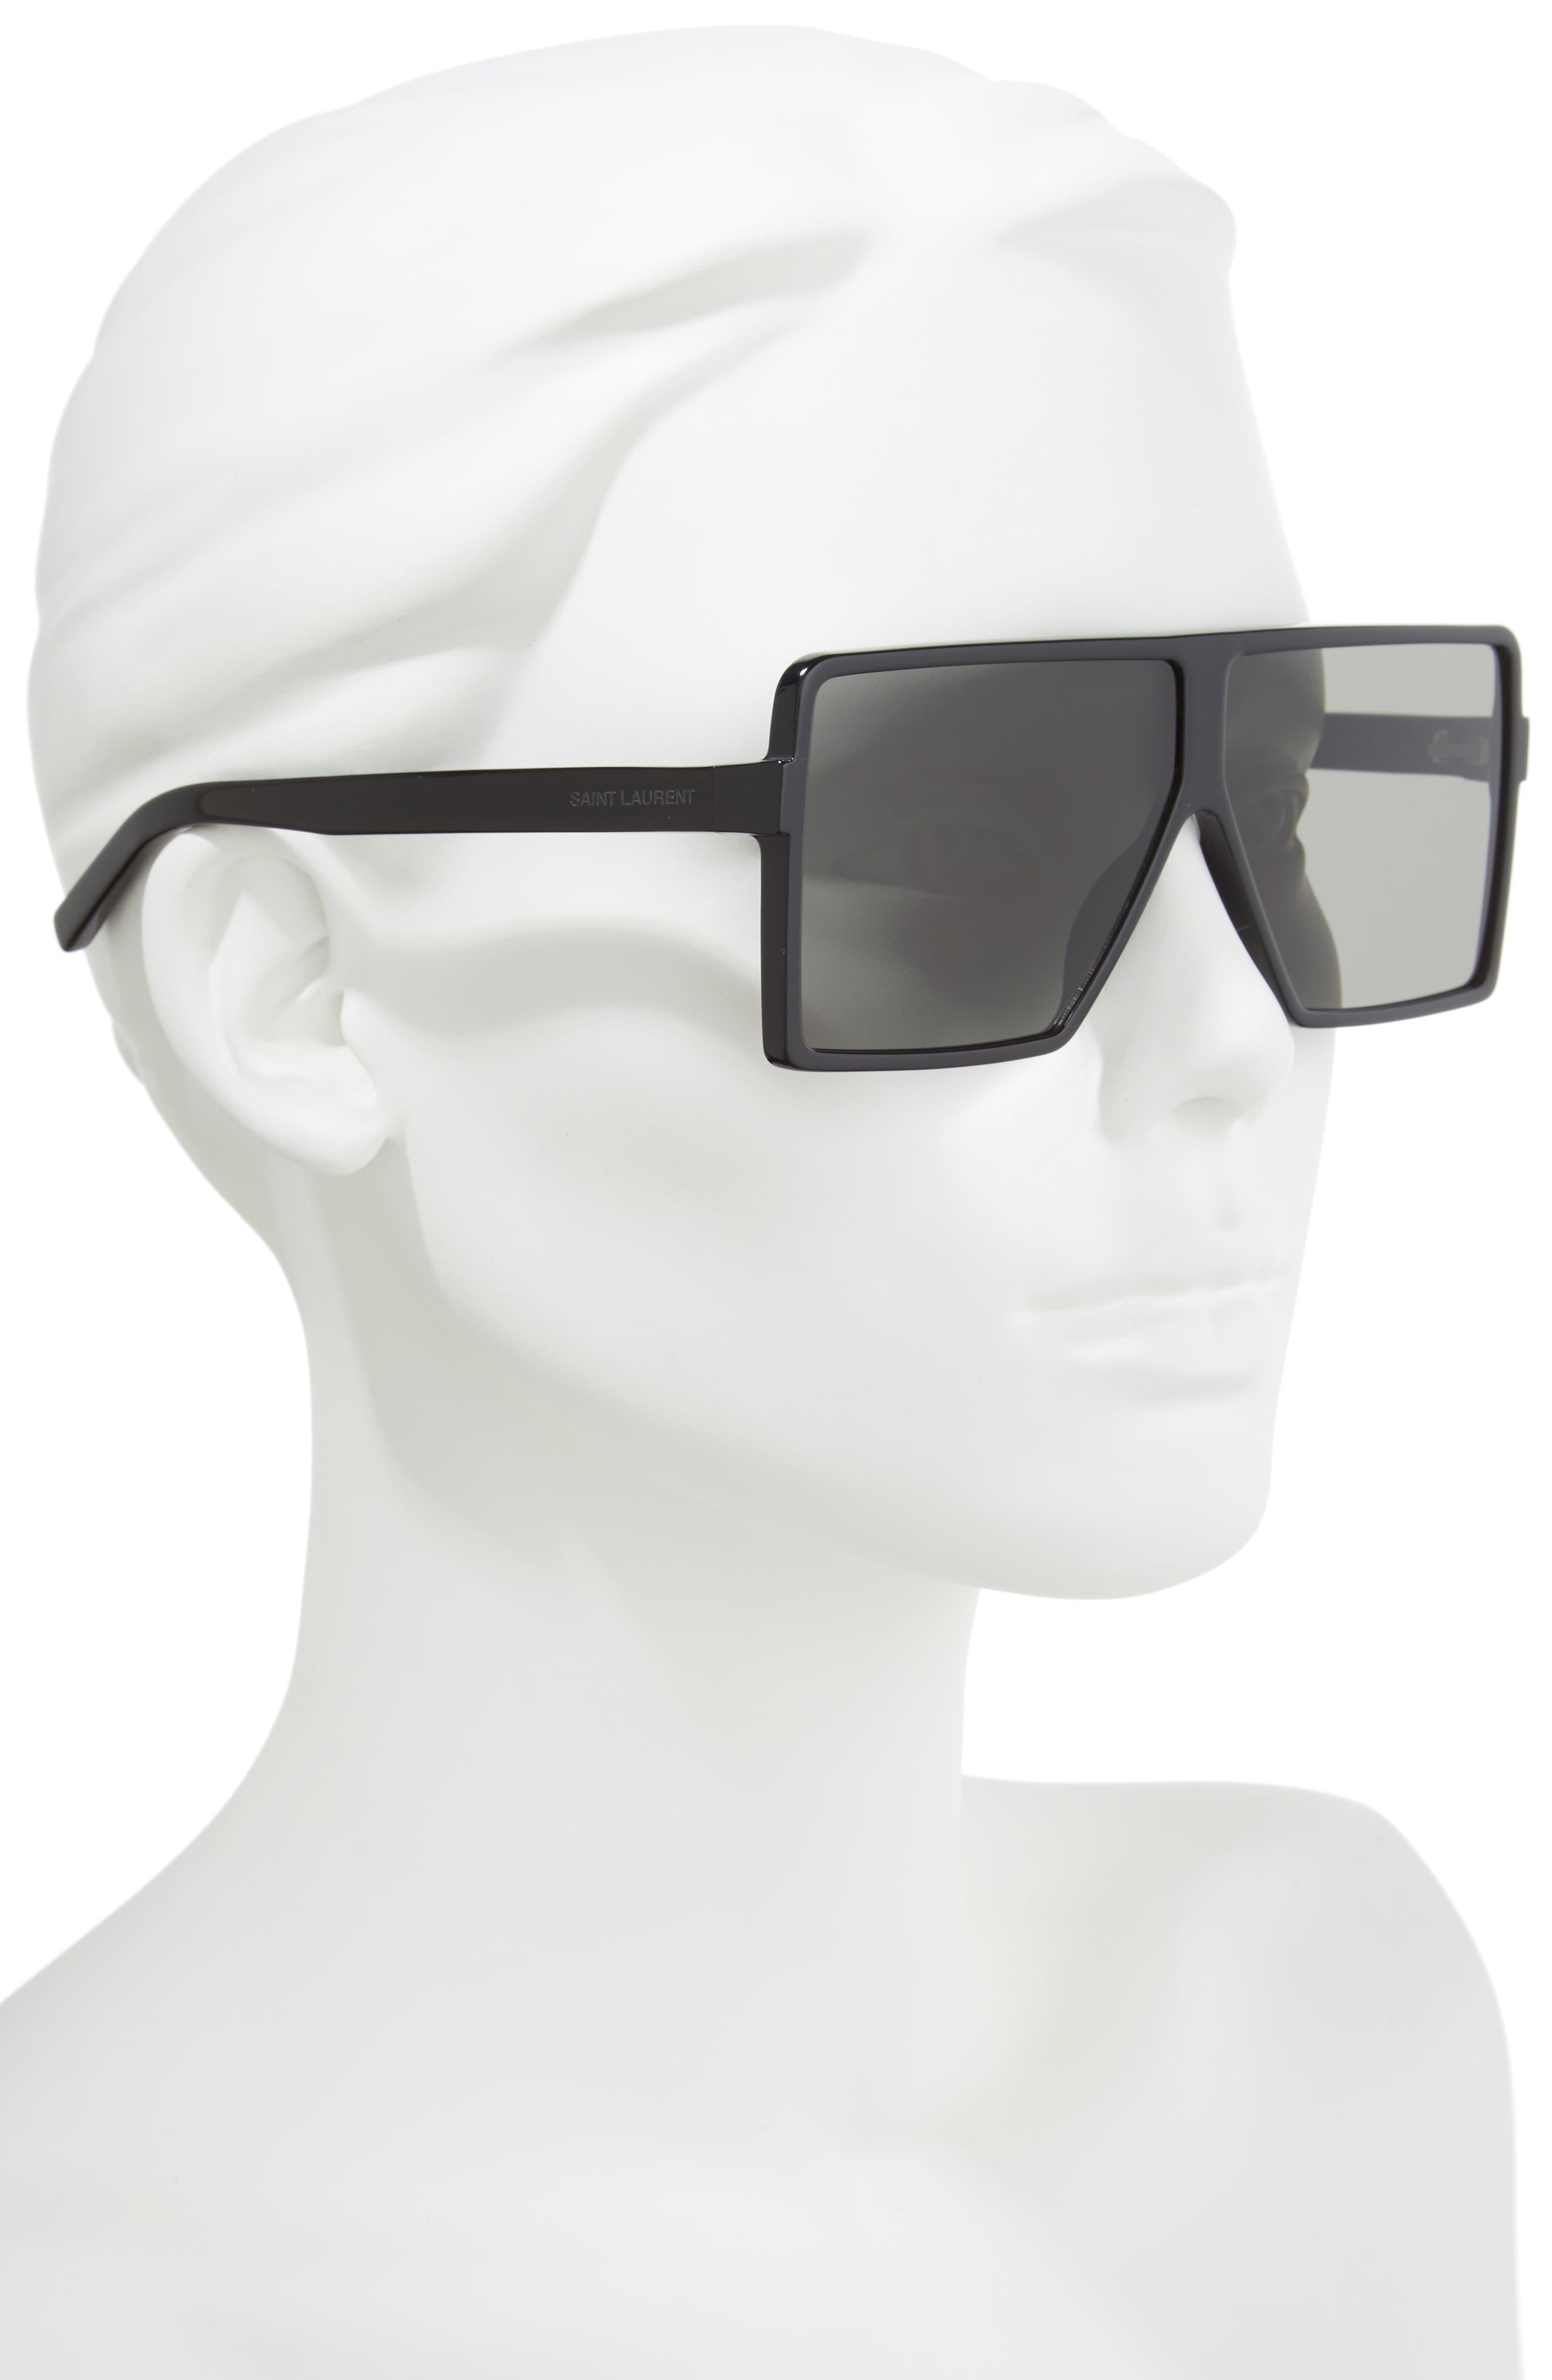 SAINT LAURENT, Betty 63mm Oversize Shield Sunglasses, Alternate thumbnail 2, color, BLACK